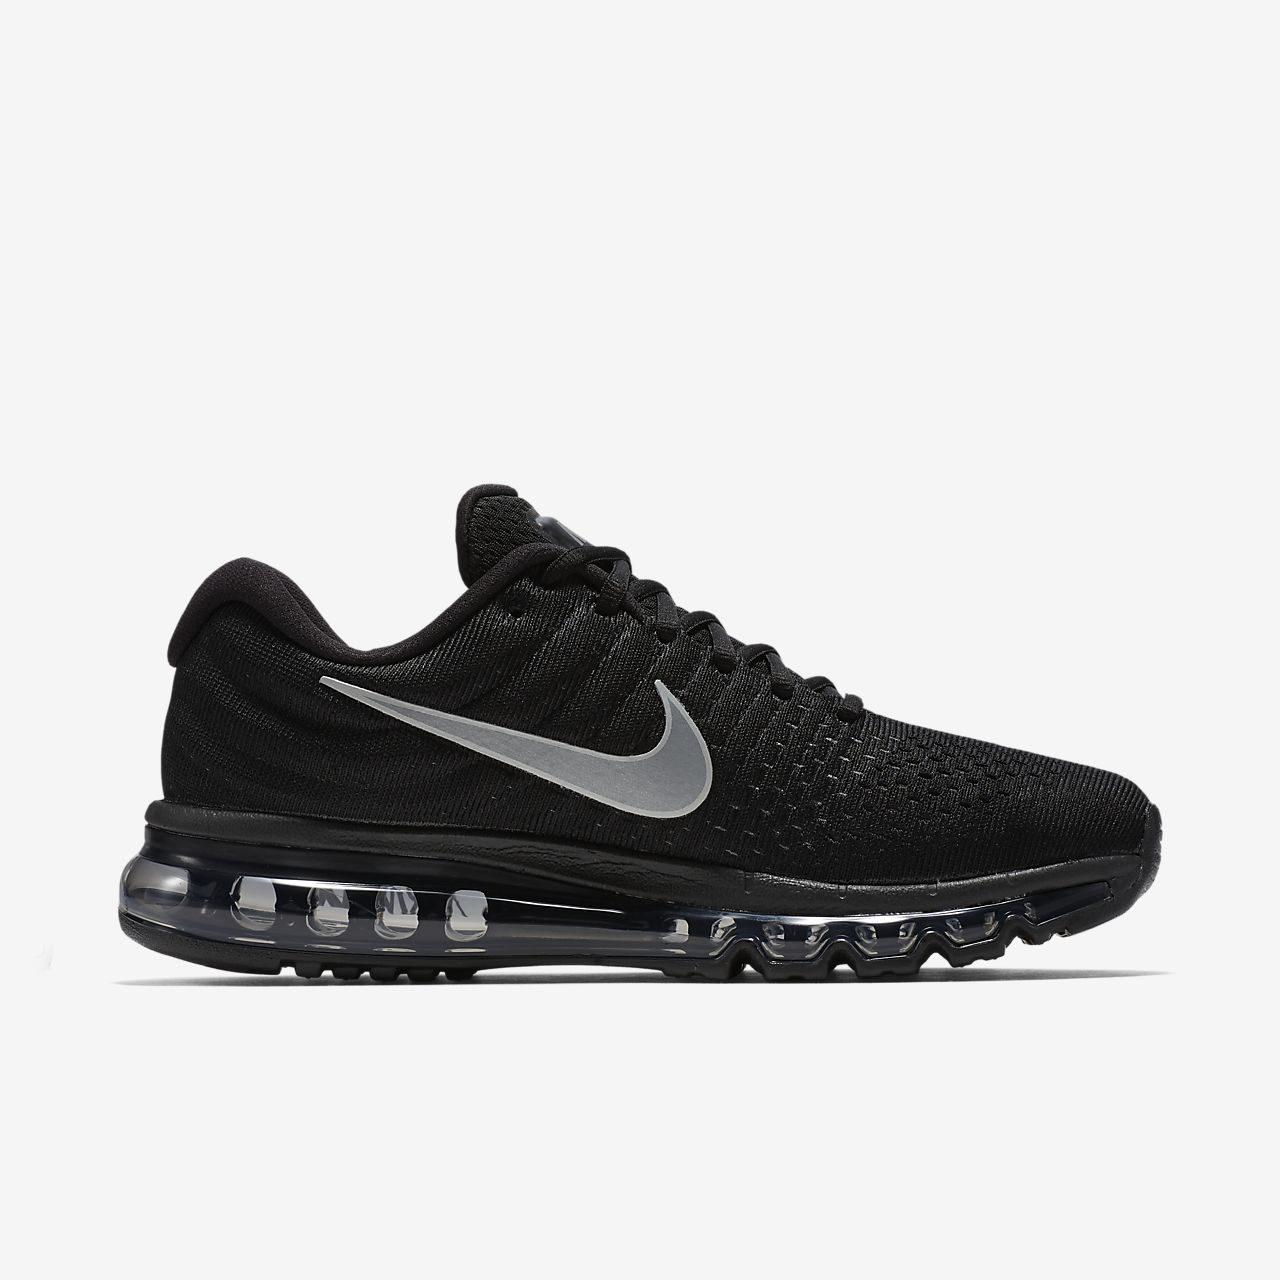 Airmax nike shoes ... nike air max 2017 menu0027s running shoe OXVZYWH